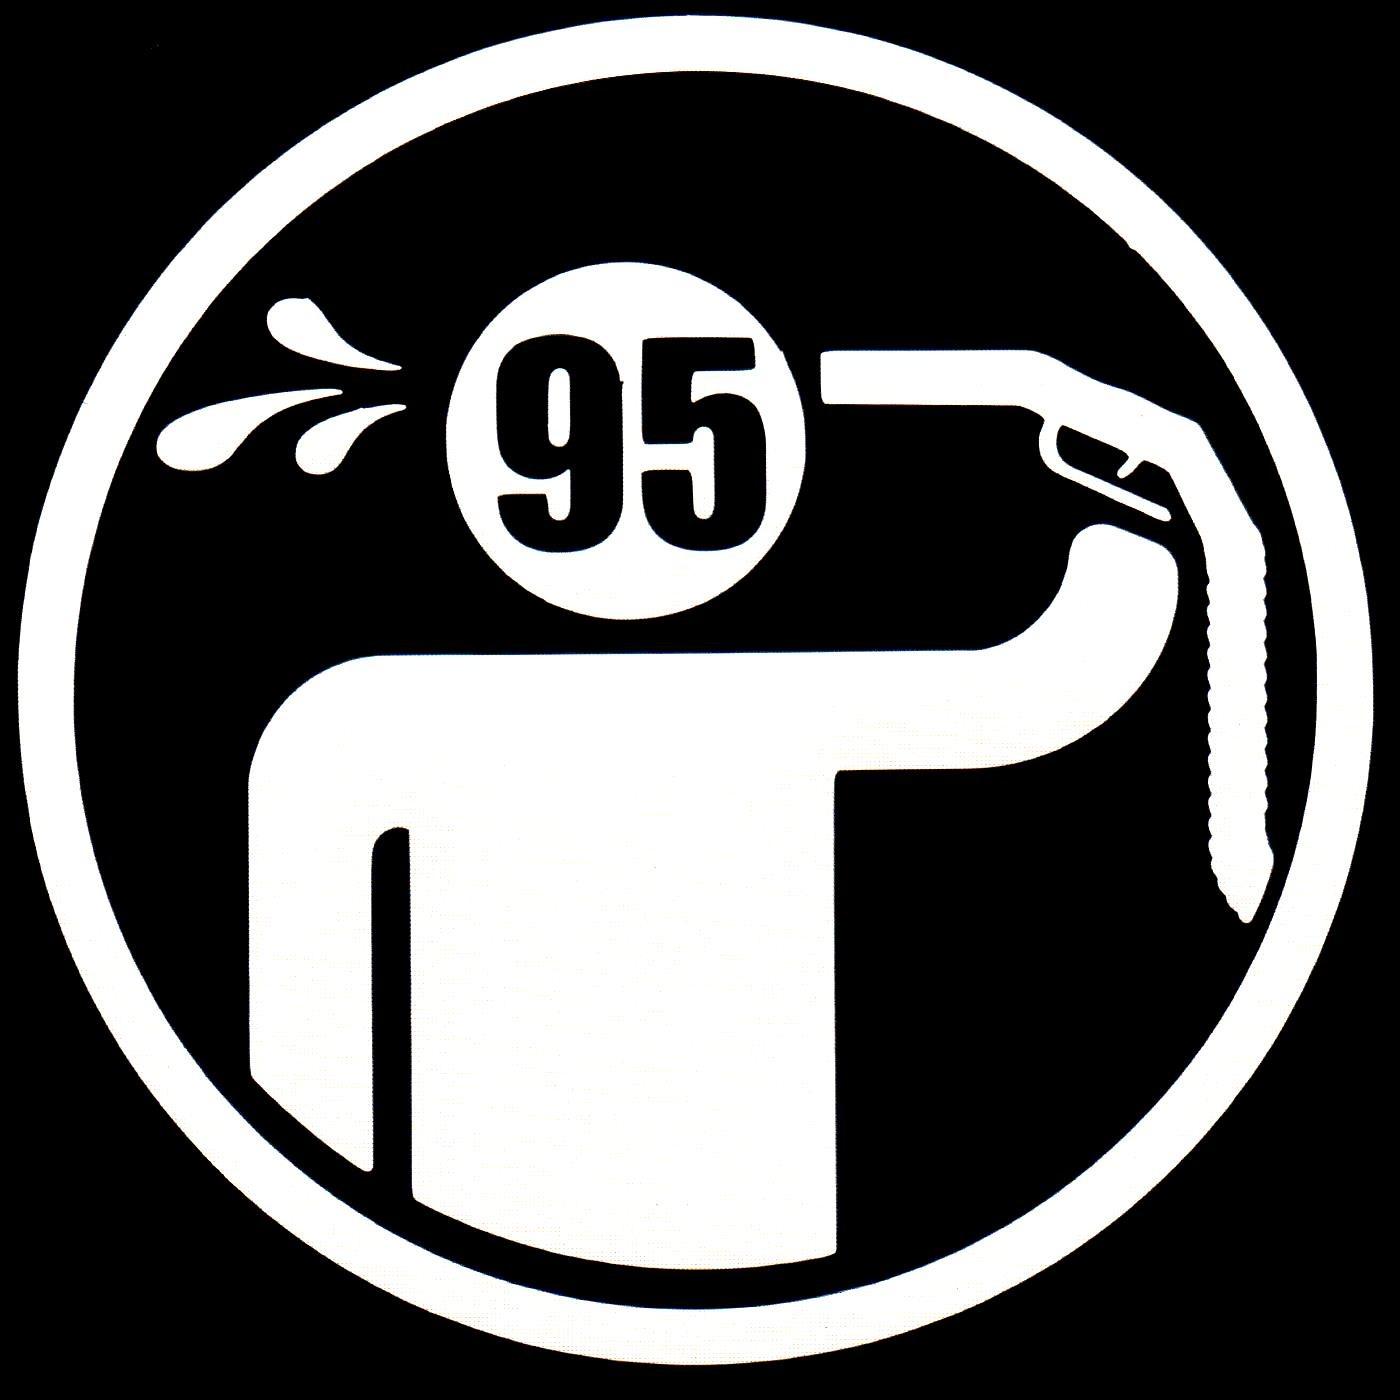 Наклейка автомобильная Mashinokom Цена АИ-95, VRC 015-13, 11,5*11,5 см наклейка автомобильная mashinokom внимание дети vrc 431 03 винил 10х12 см